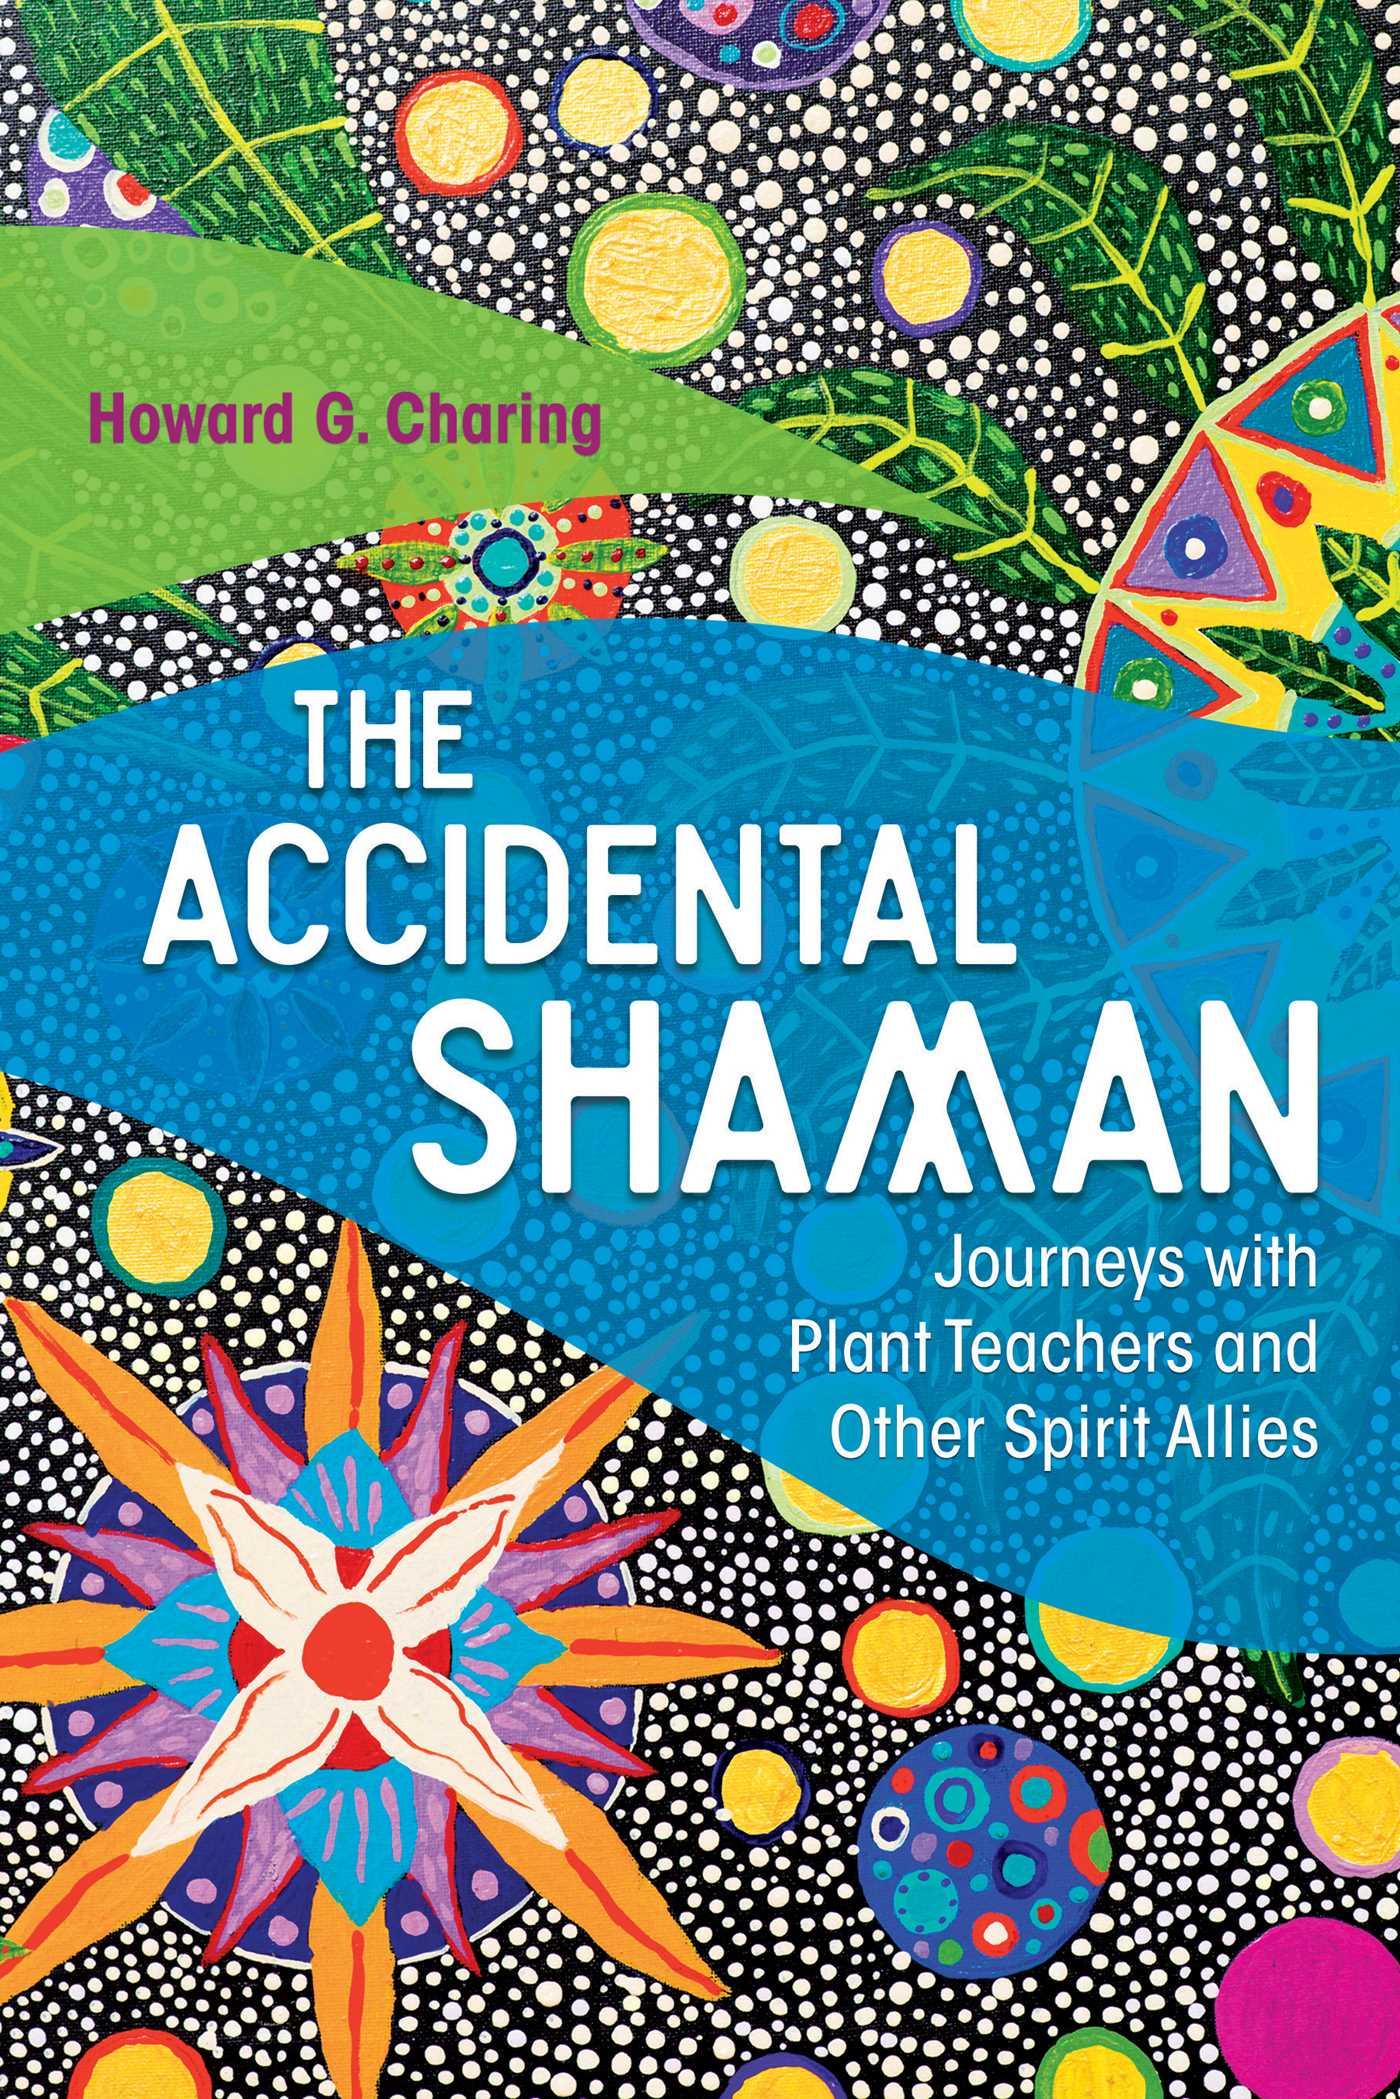 The accidental shaman 9781620556092 hr